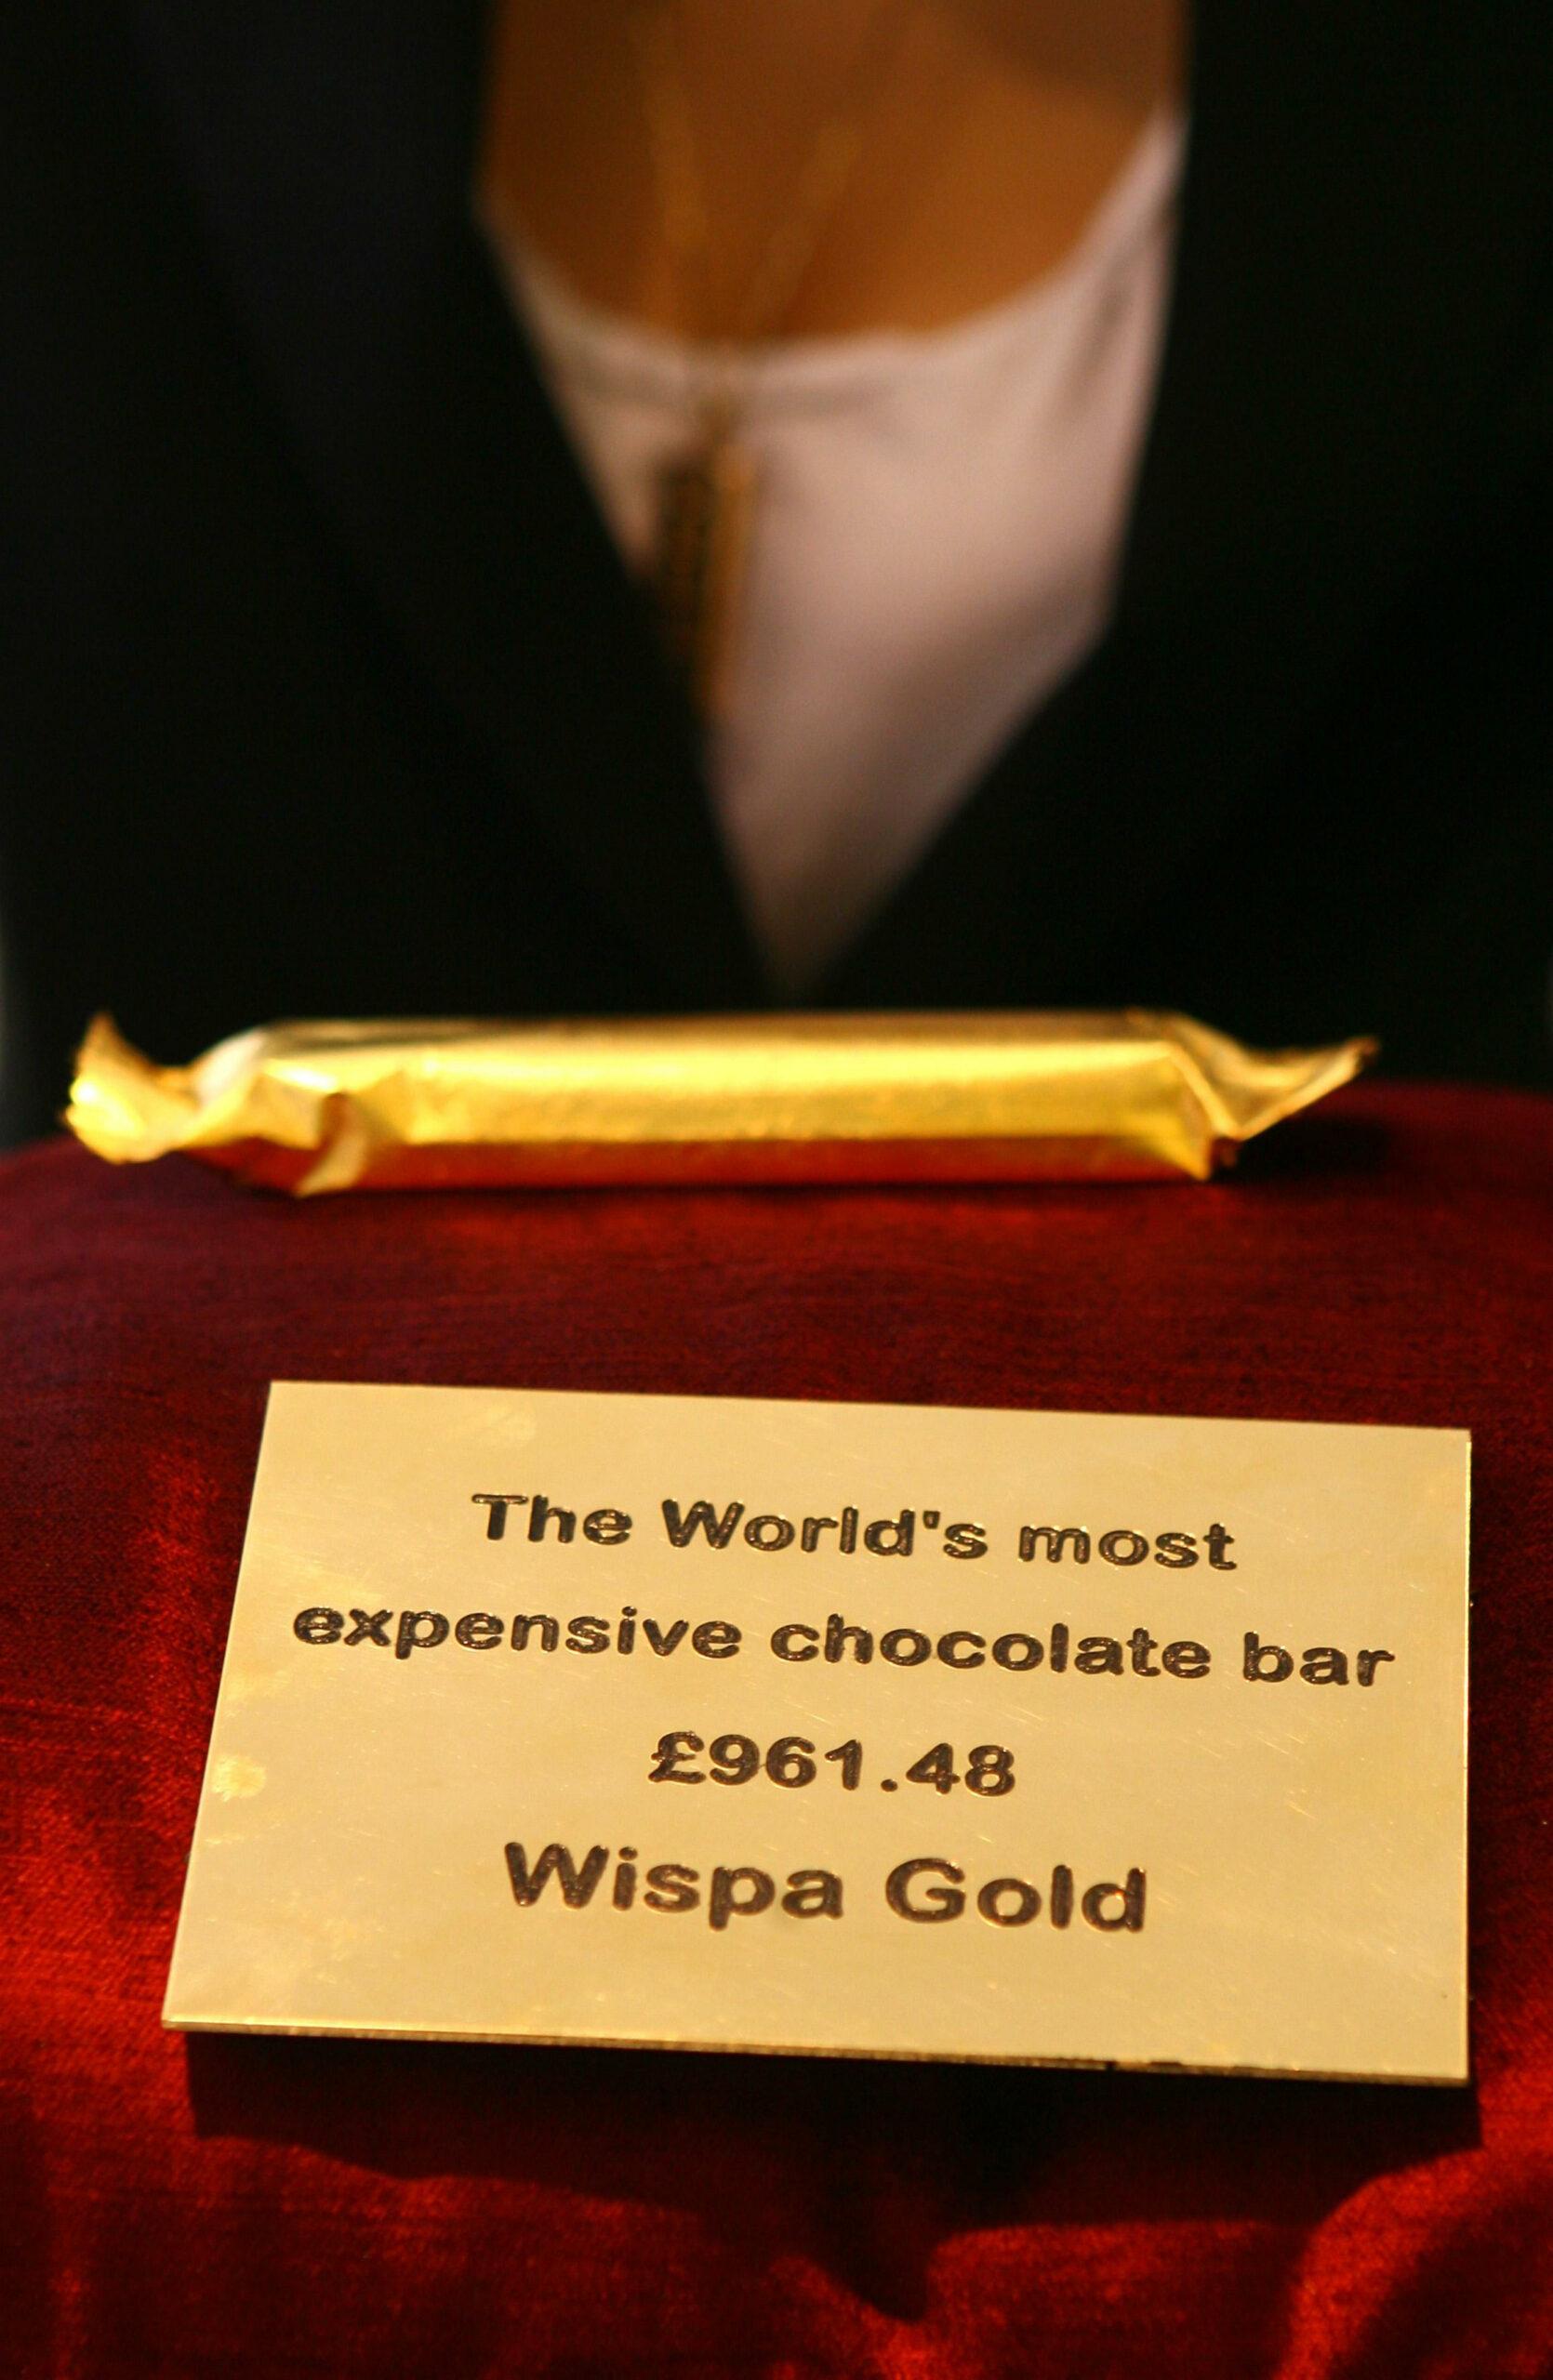 Wispa Gold chocolate bar